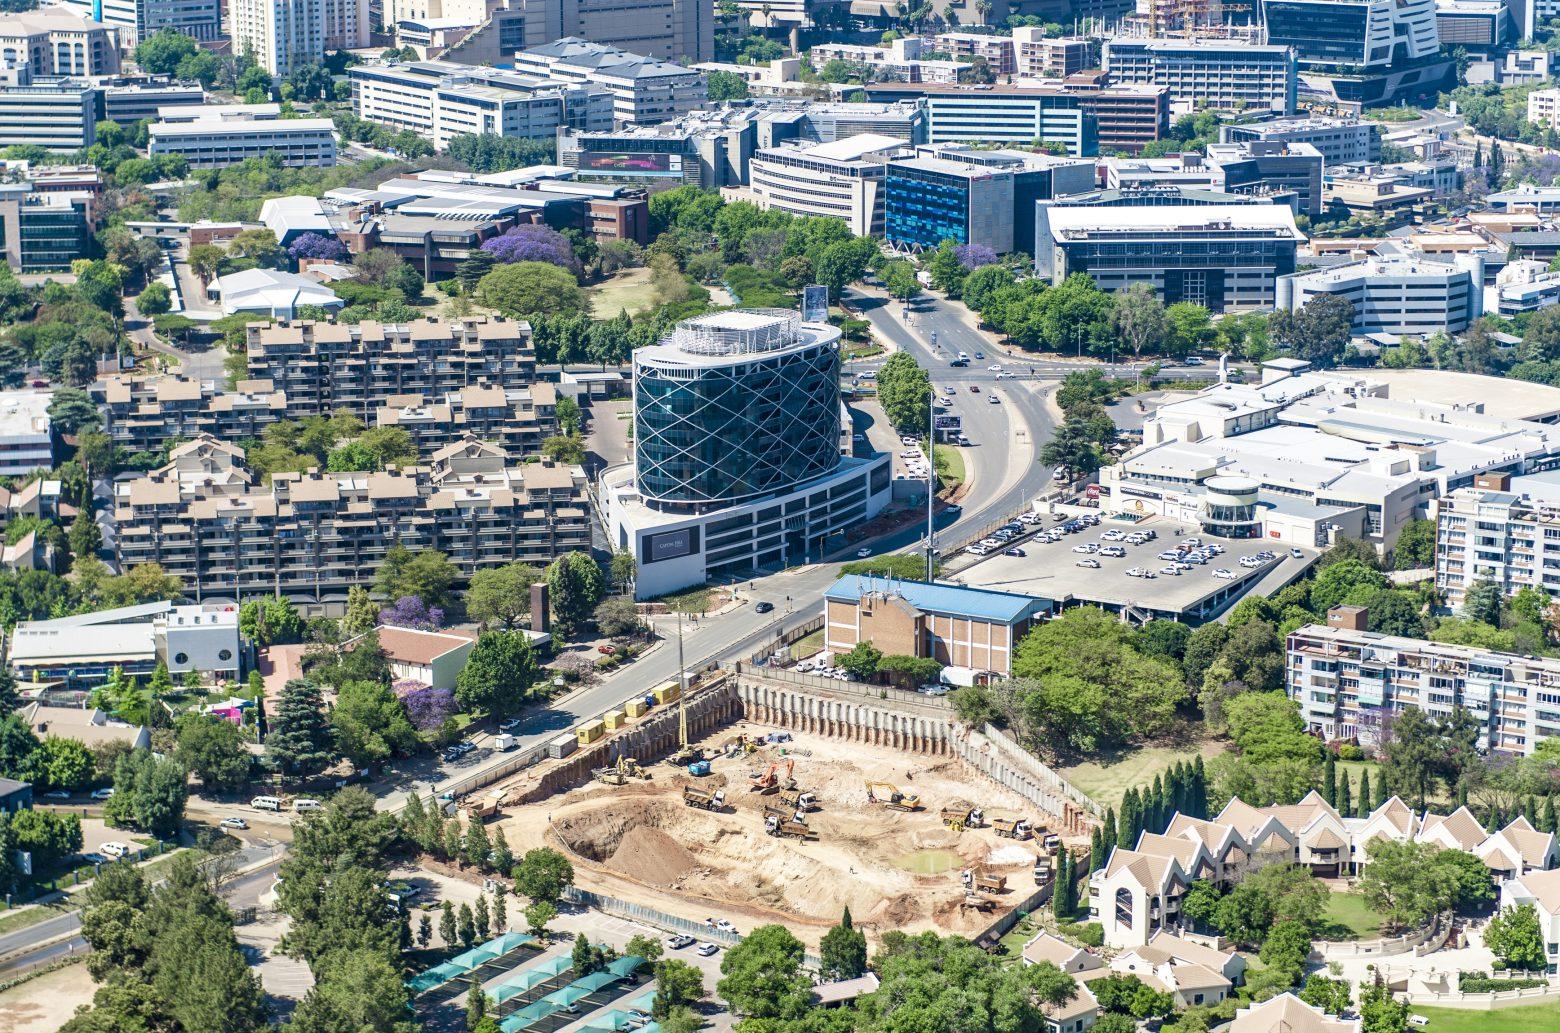 Capital Hill Aerial